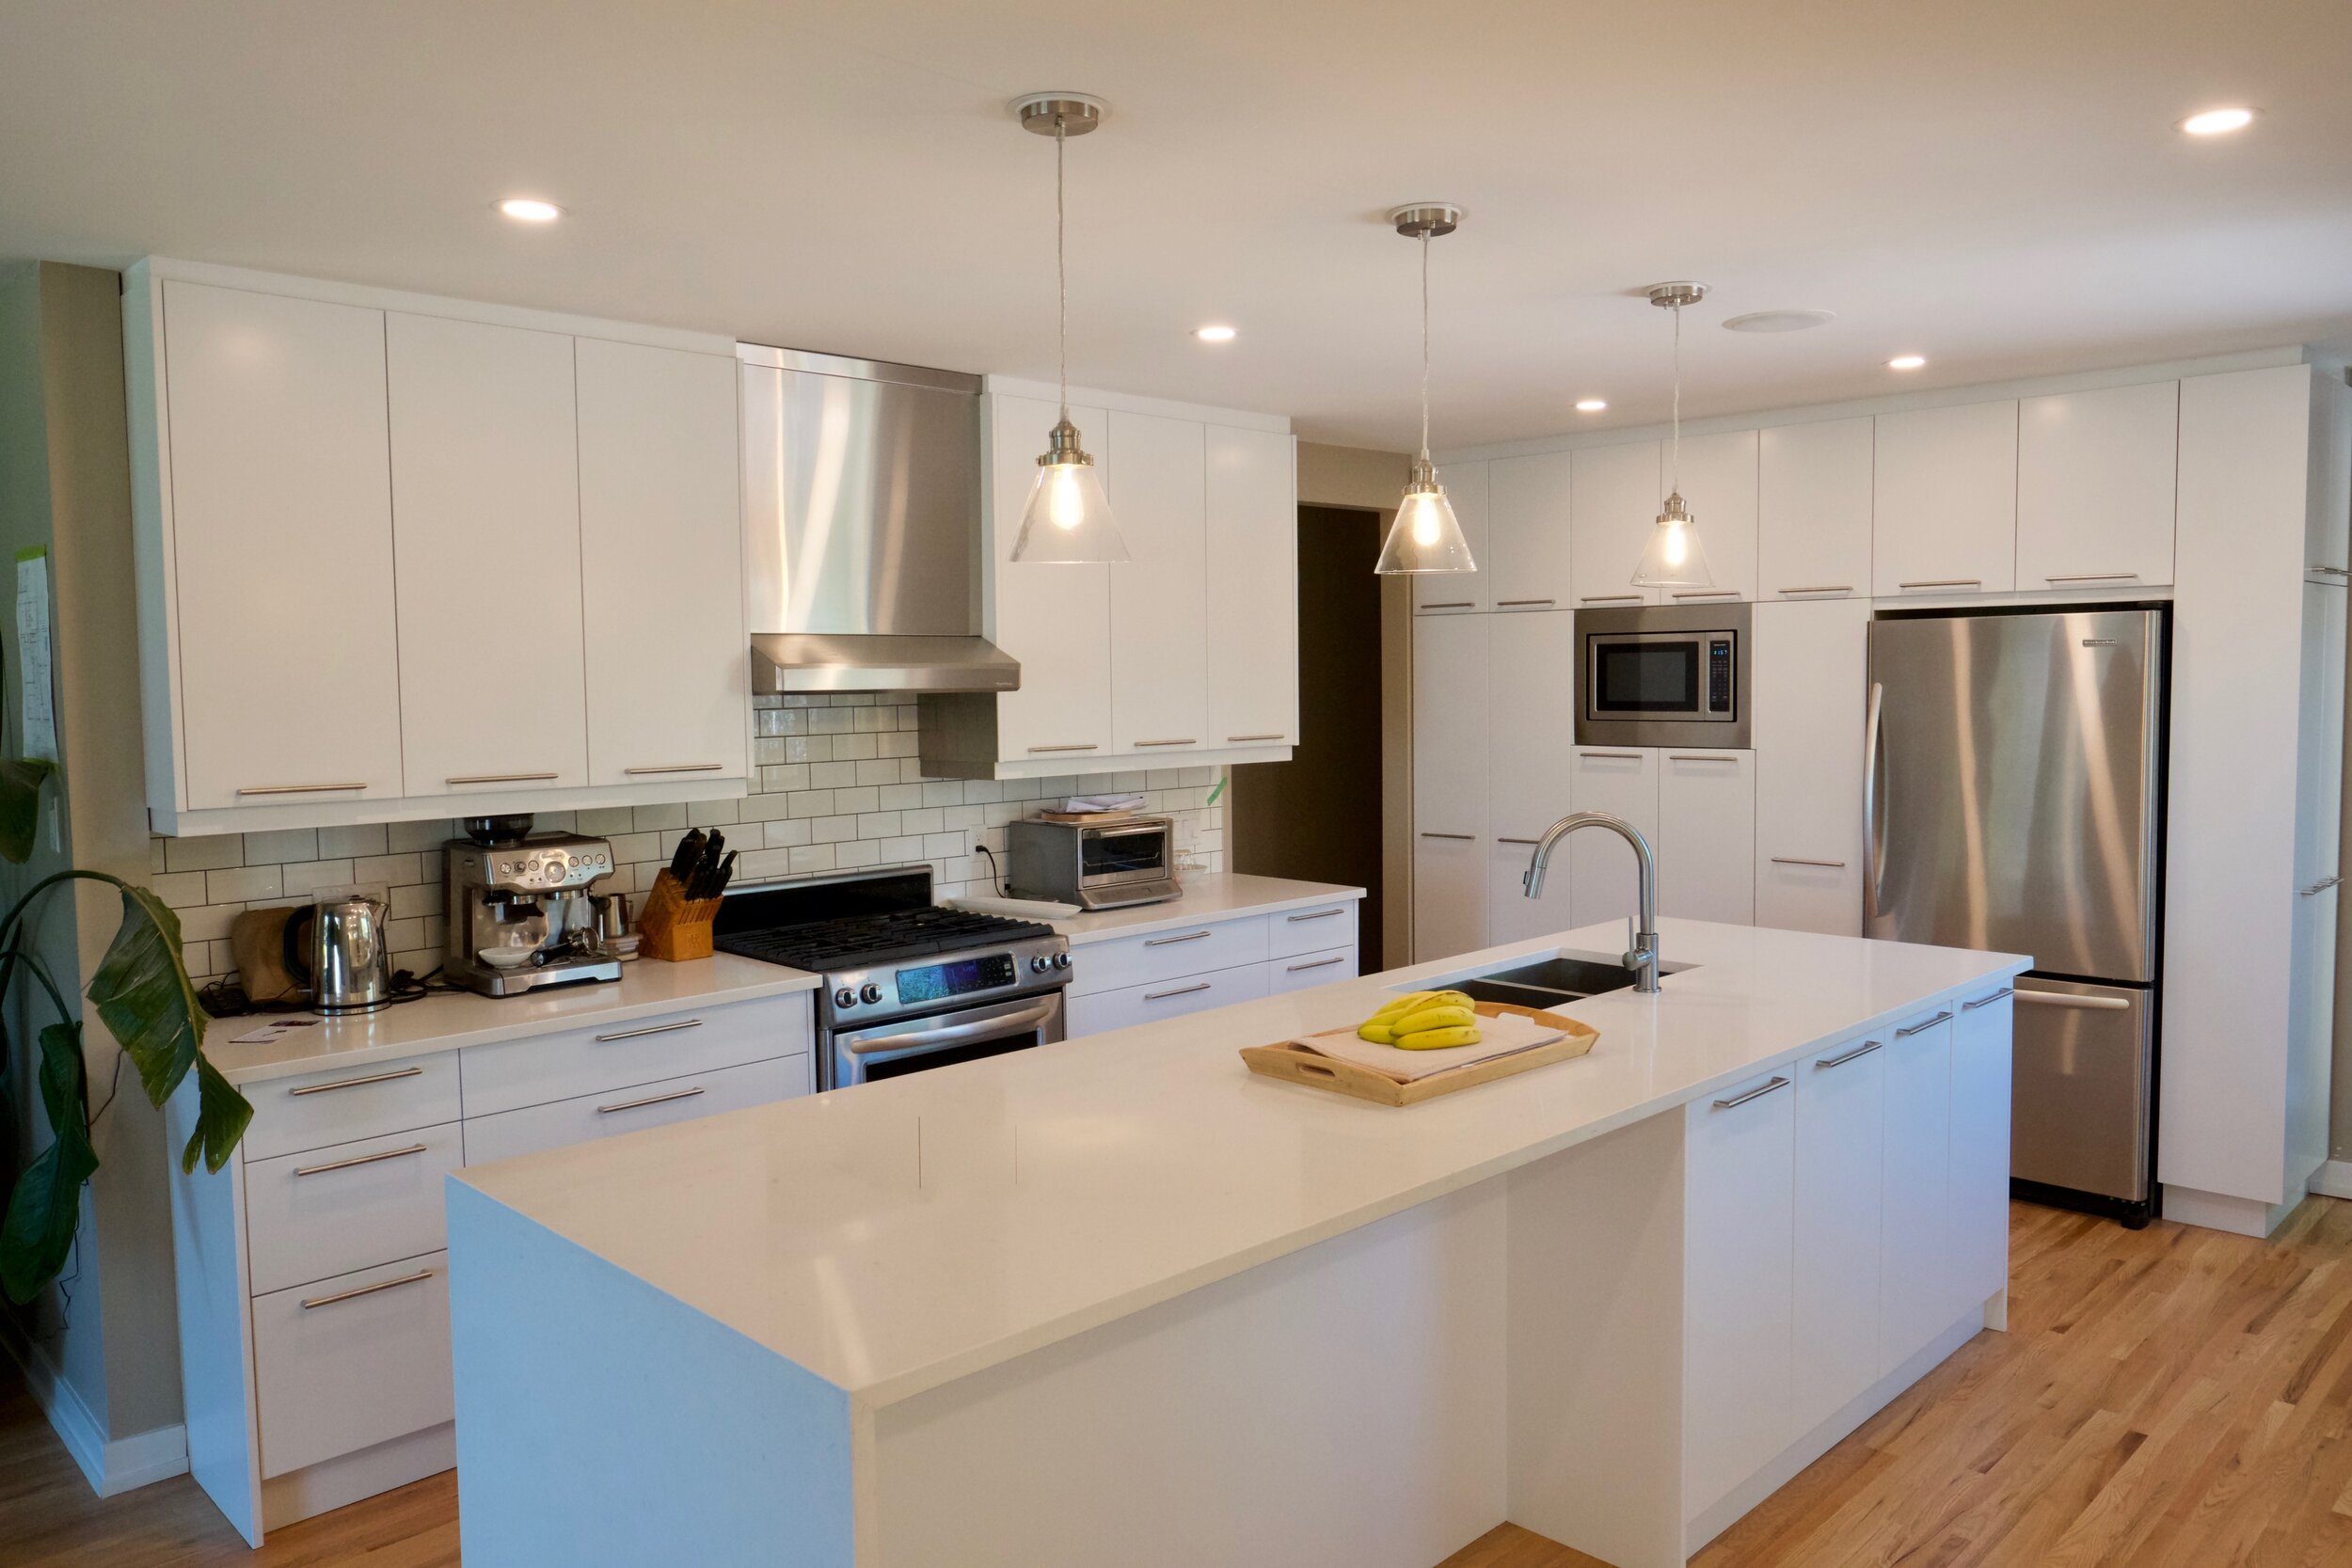 modern kitchen renovation, home addition Calgary.jpeg